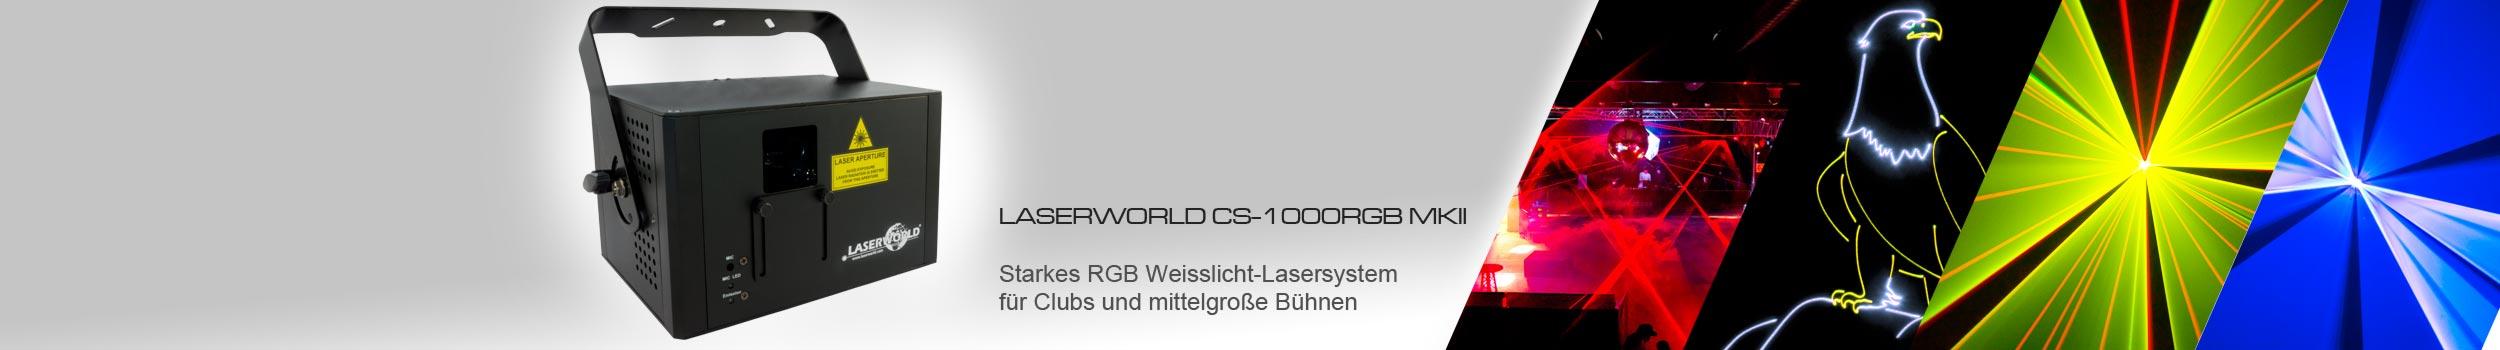 CS-1000RGBMKII (bei Kategorie RGB-Laser)